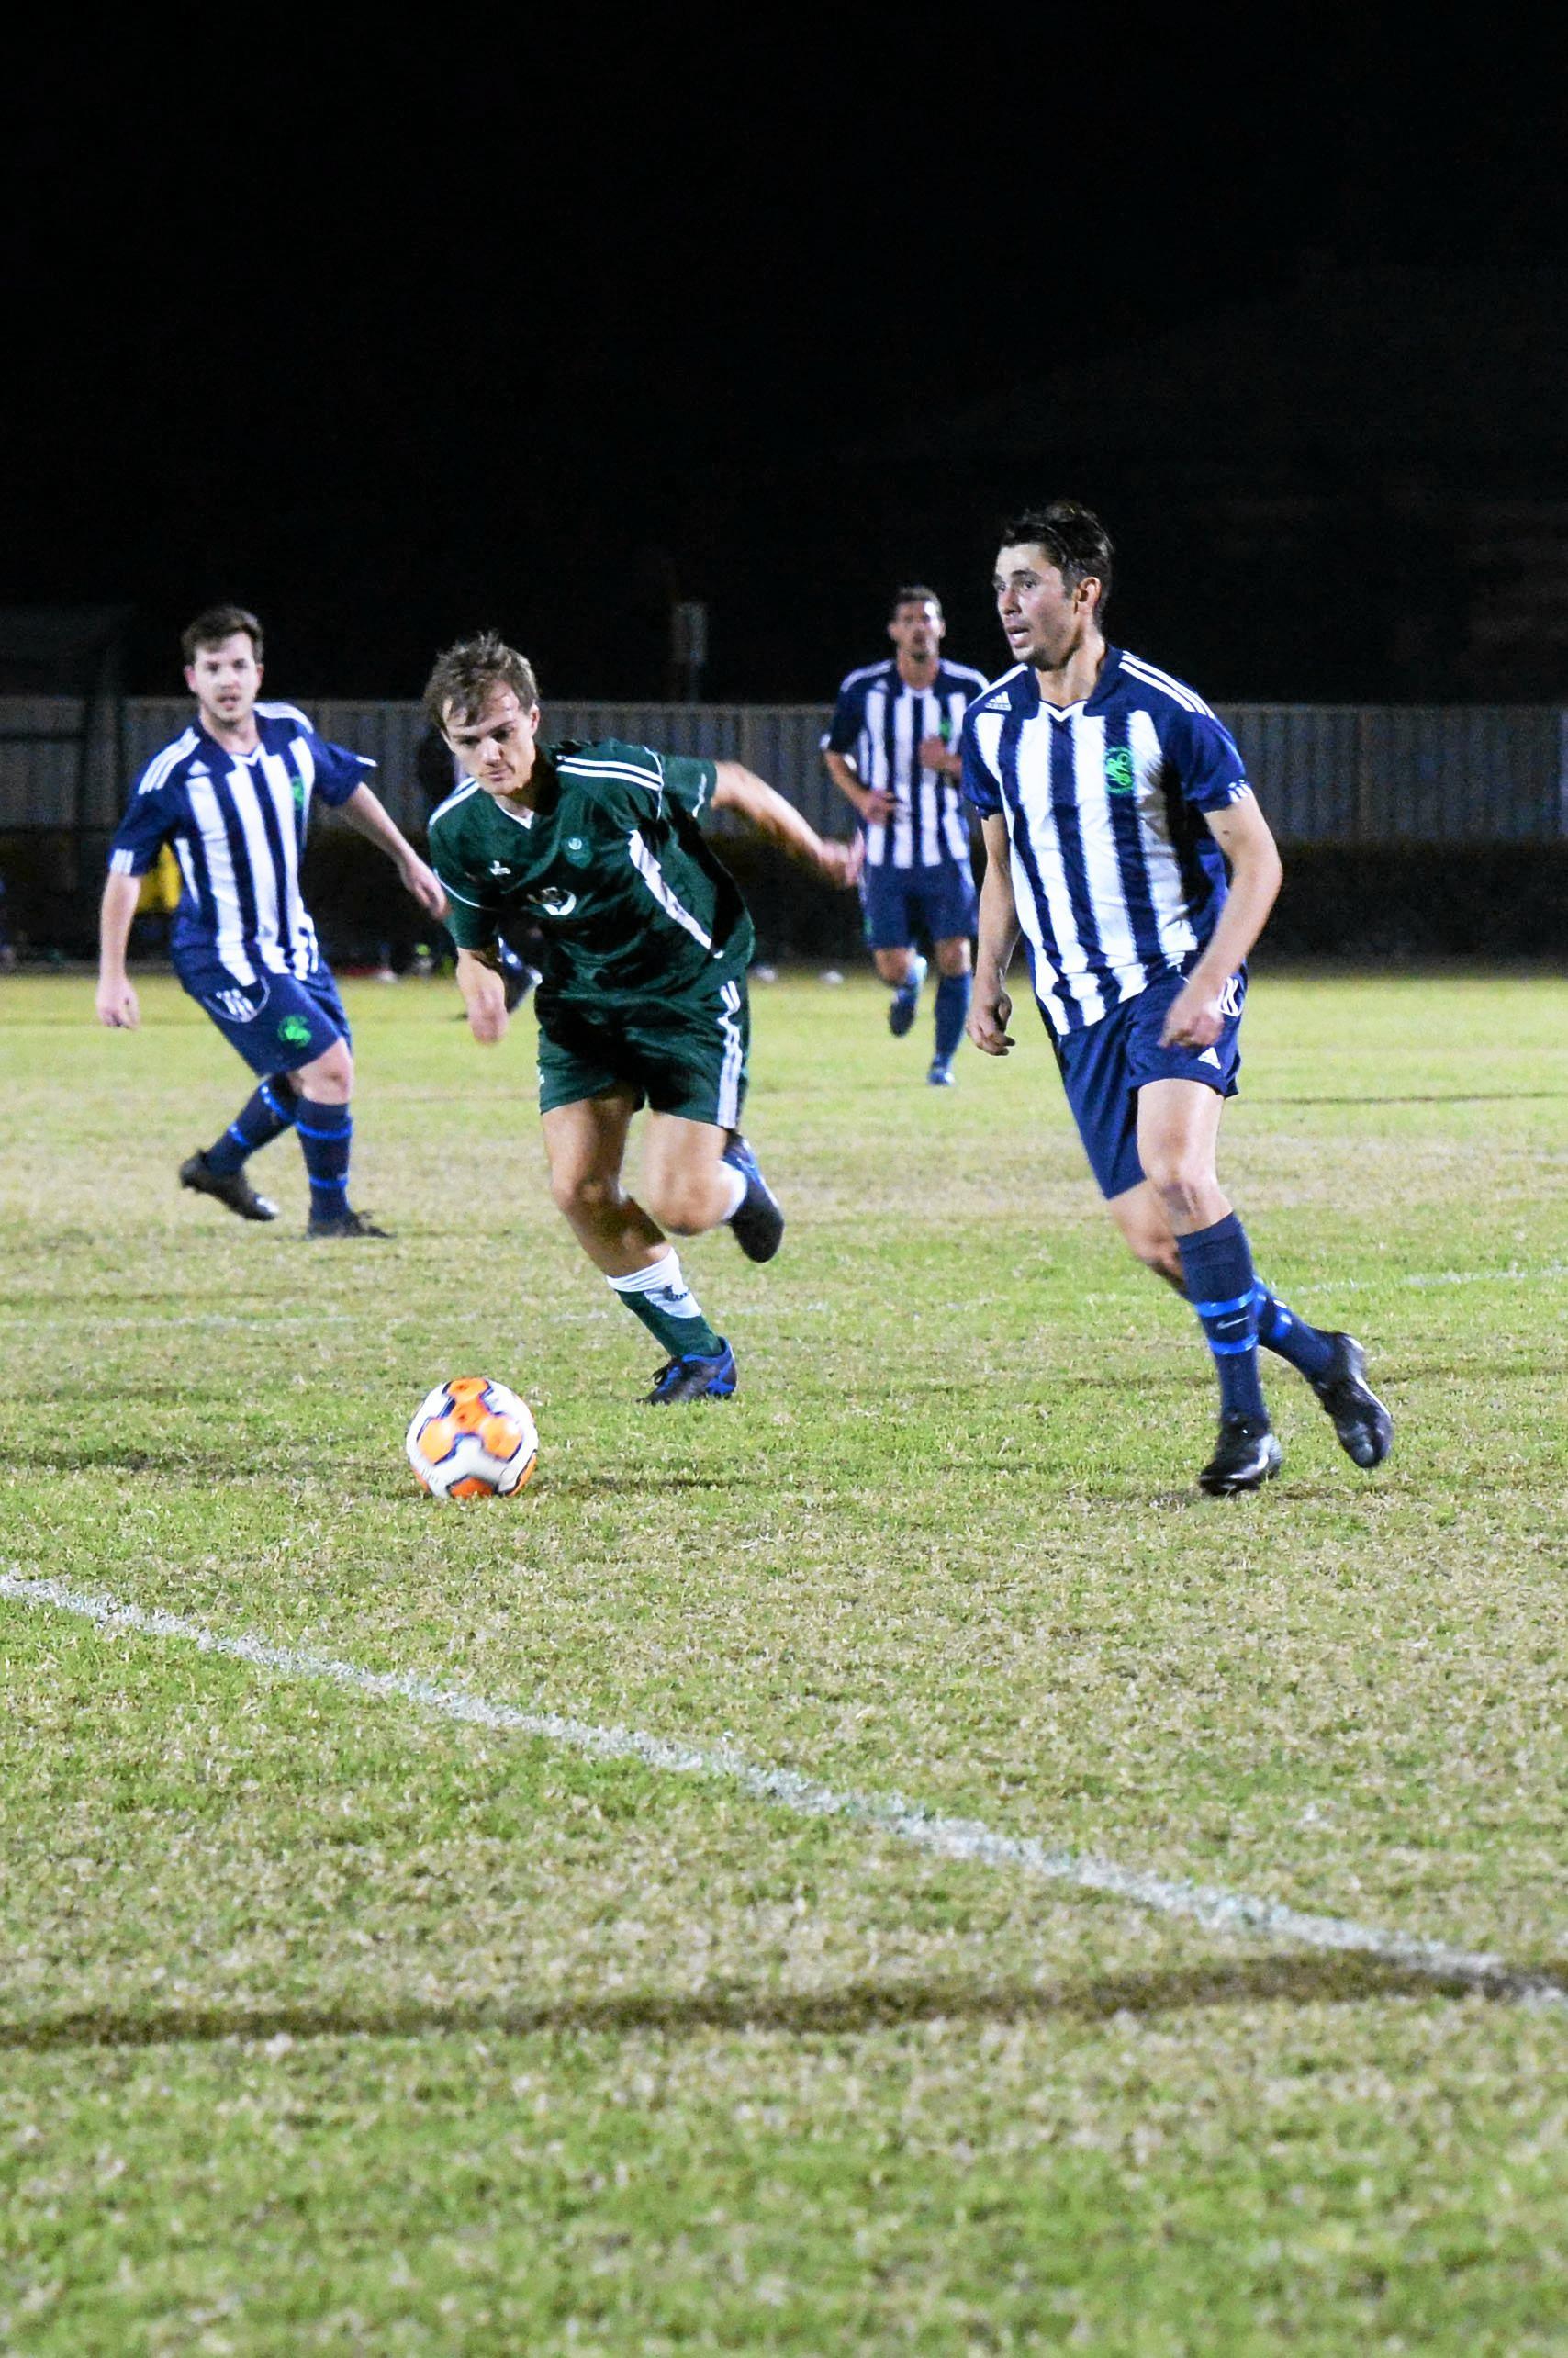 Soccer - Frenchville SC player Ben Forrest